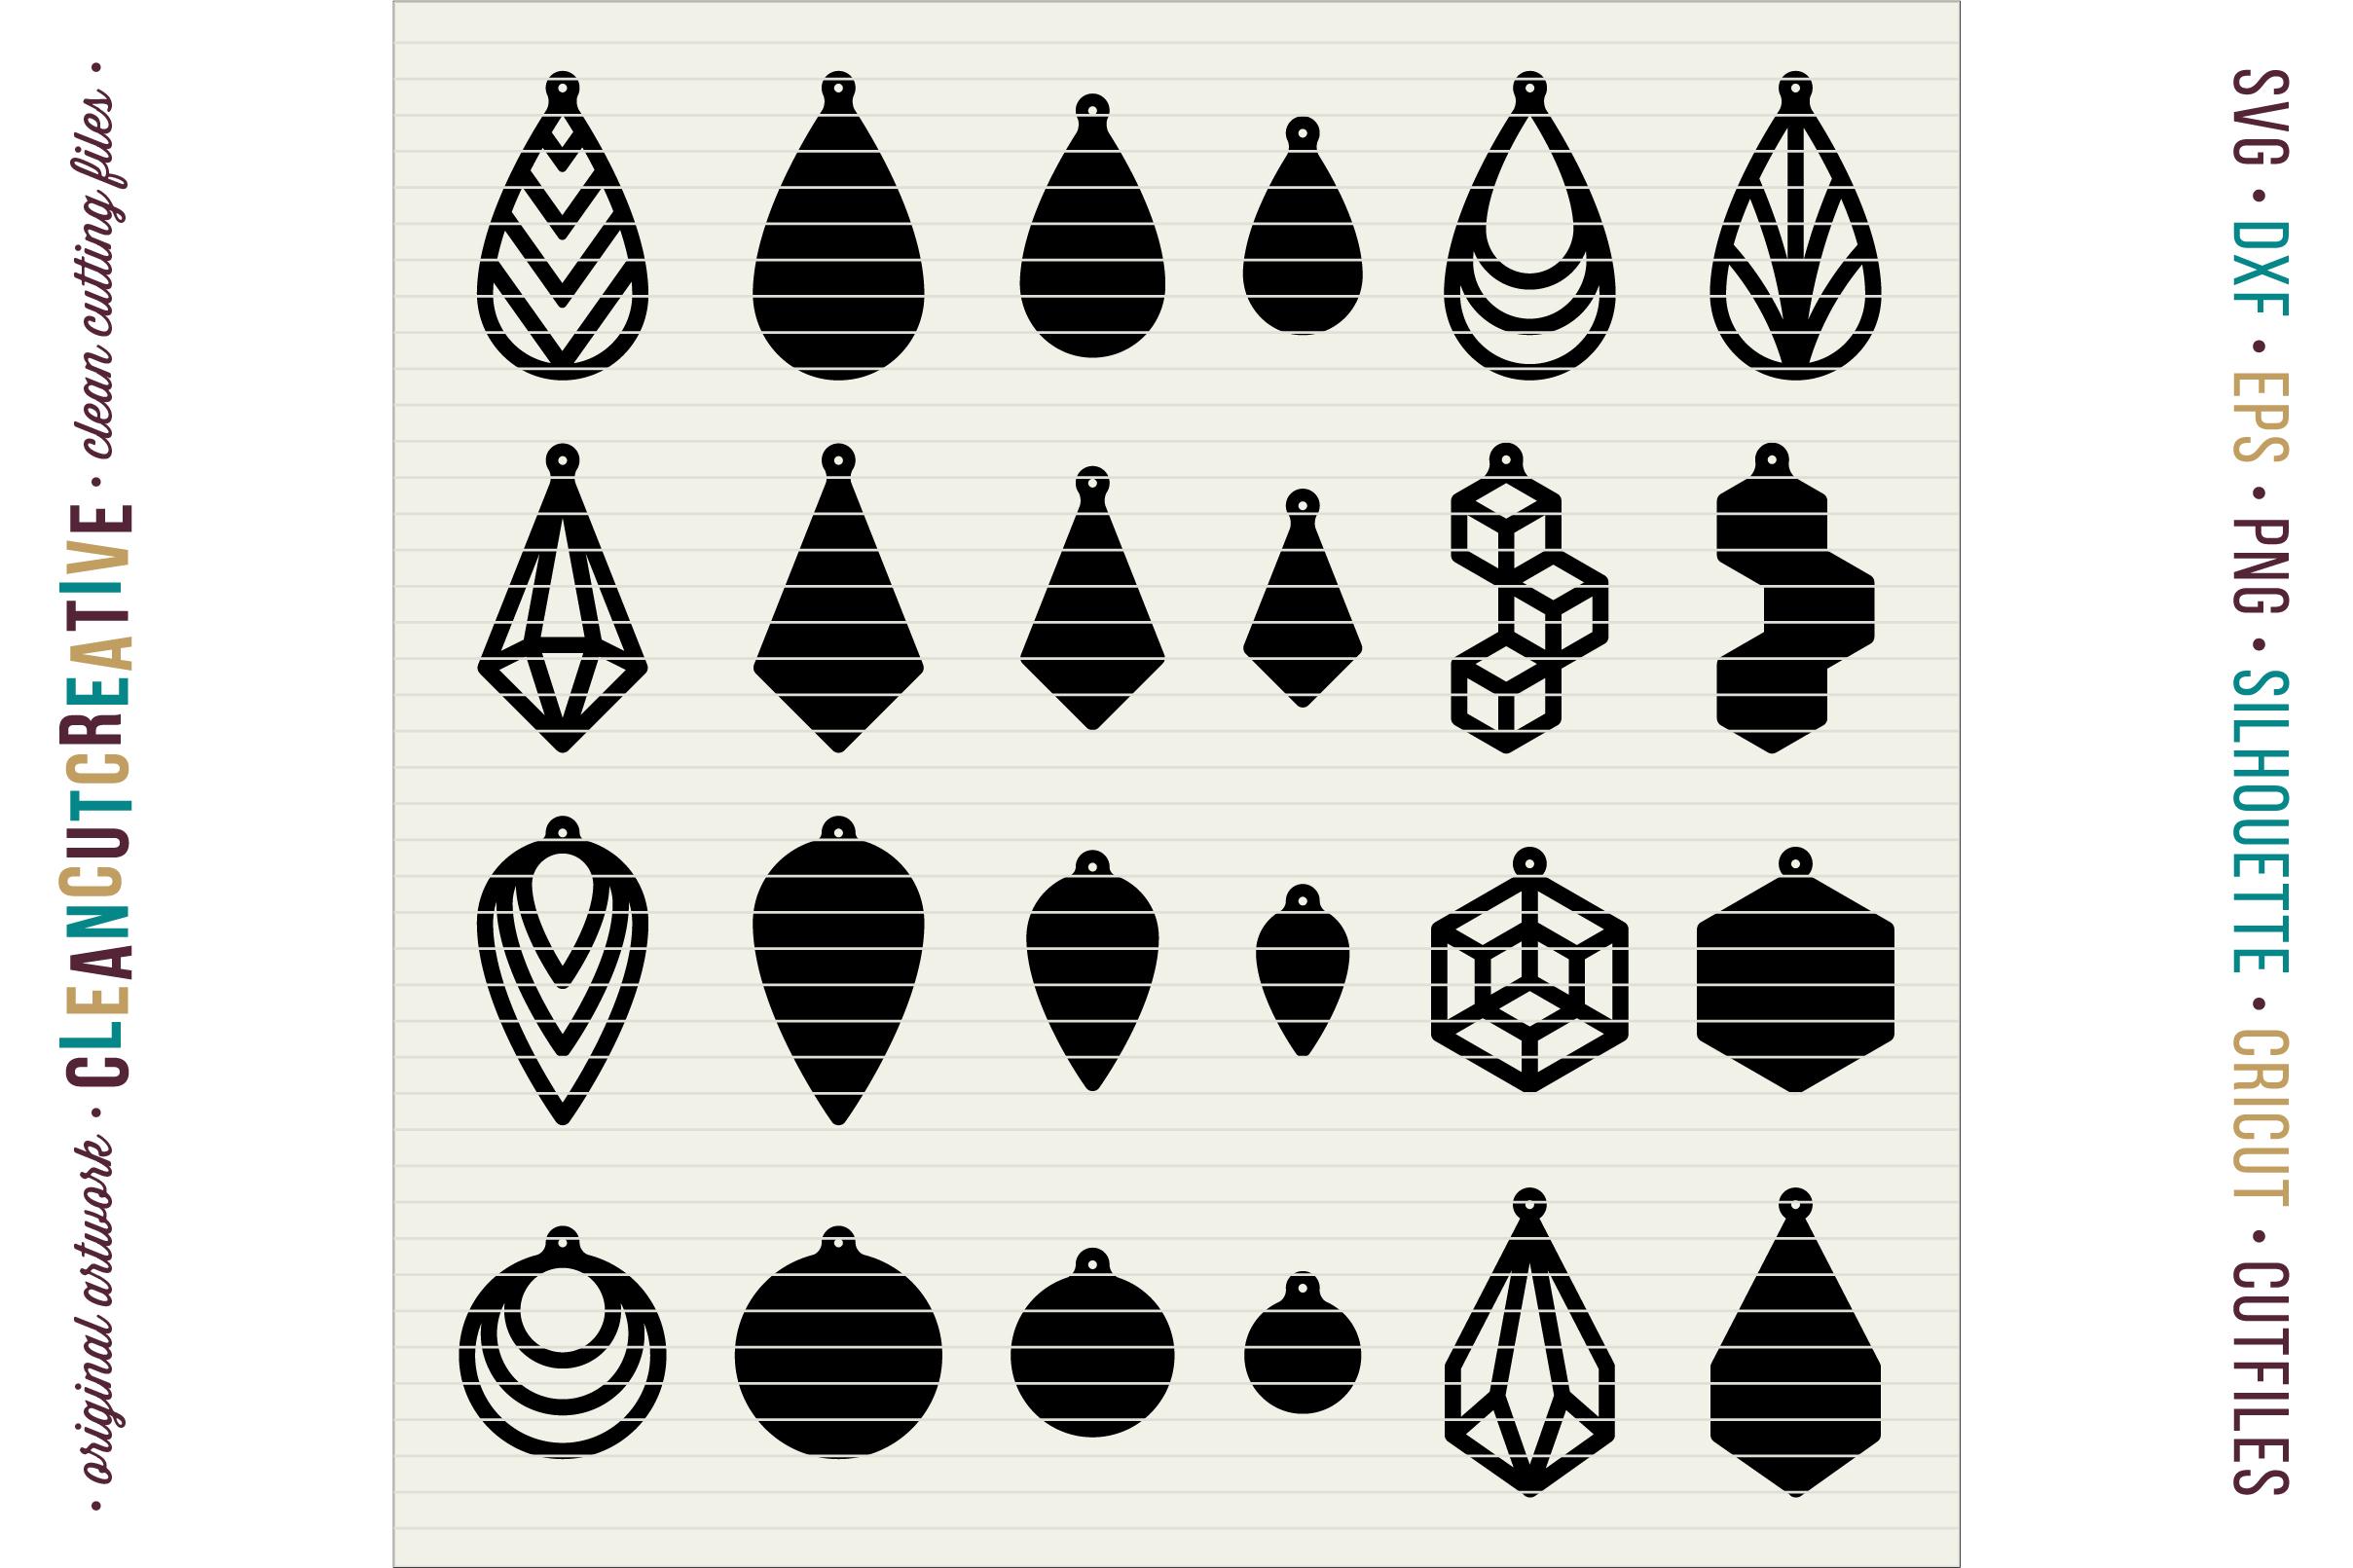 Download Set of 24 Faux Leather Earrings - SVG D | Design Bundles